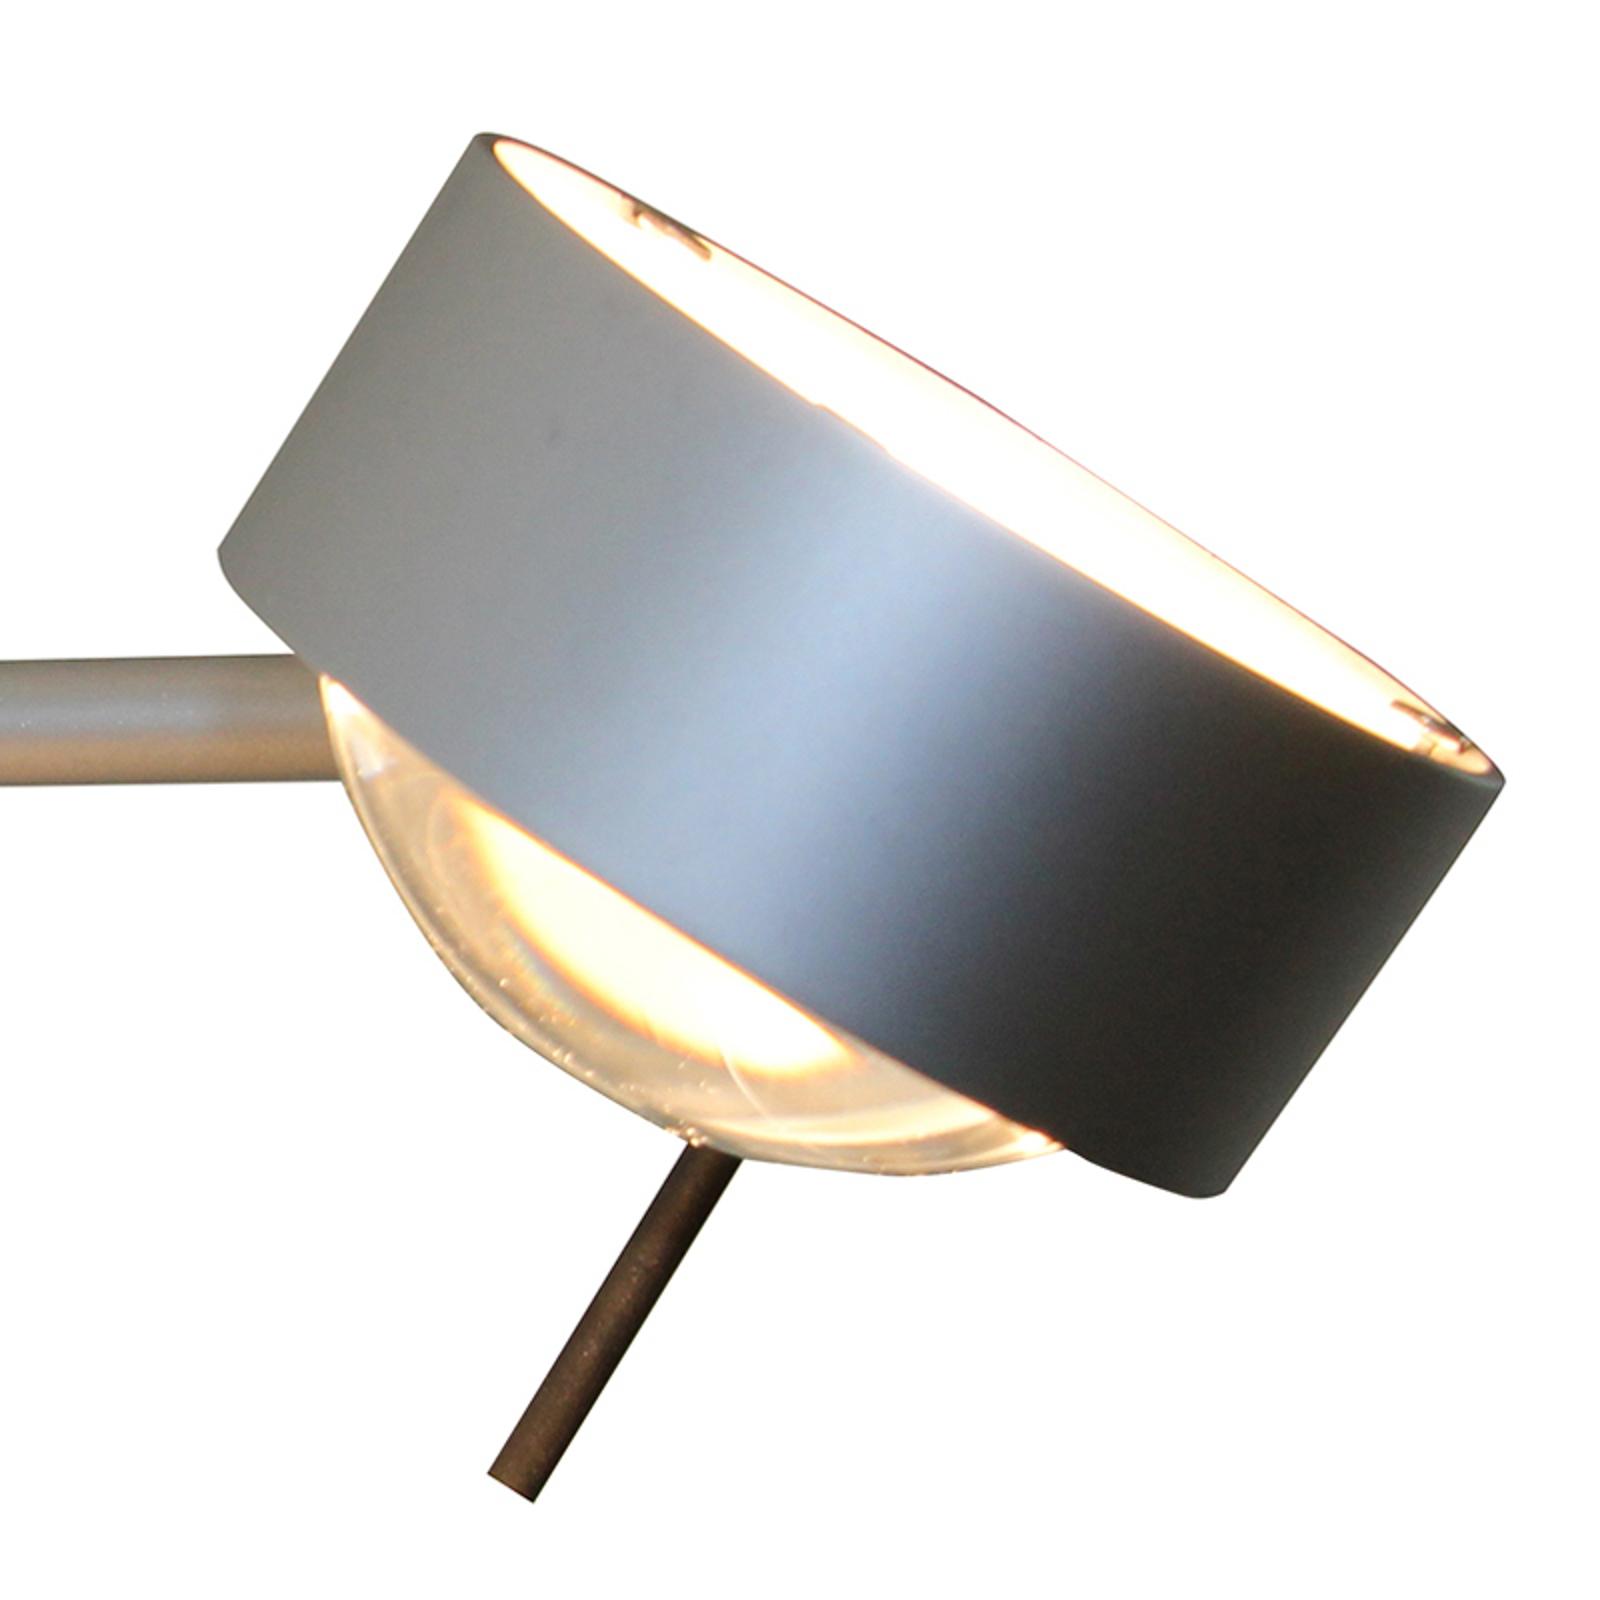 Wandlamp PUK SIDES, 1-lichts 10 cm, mat chroom